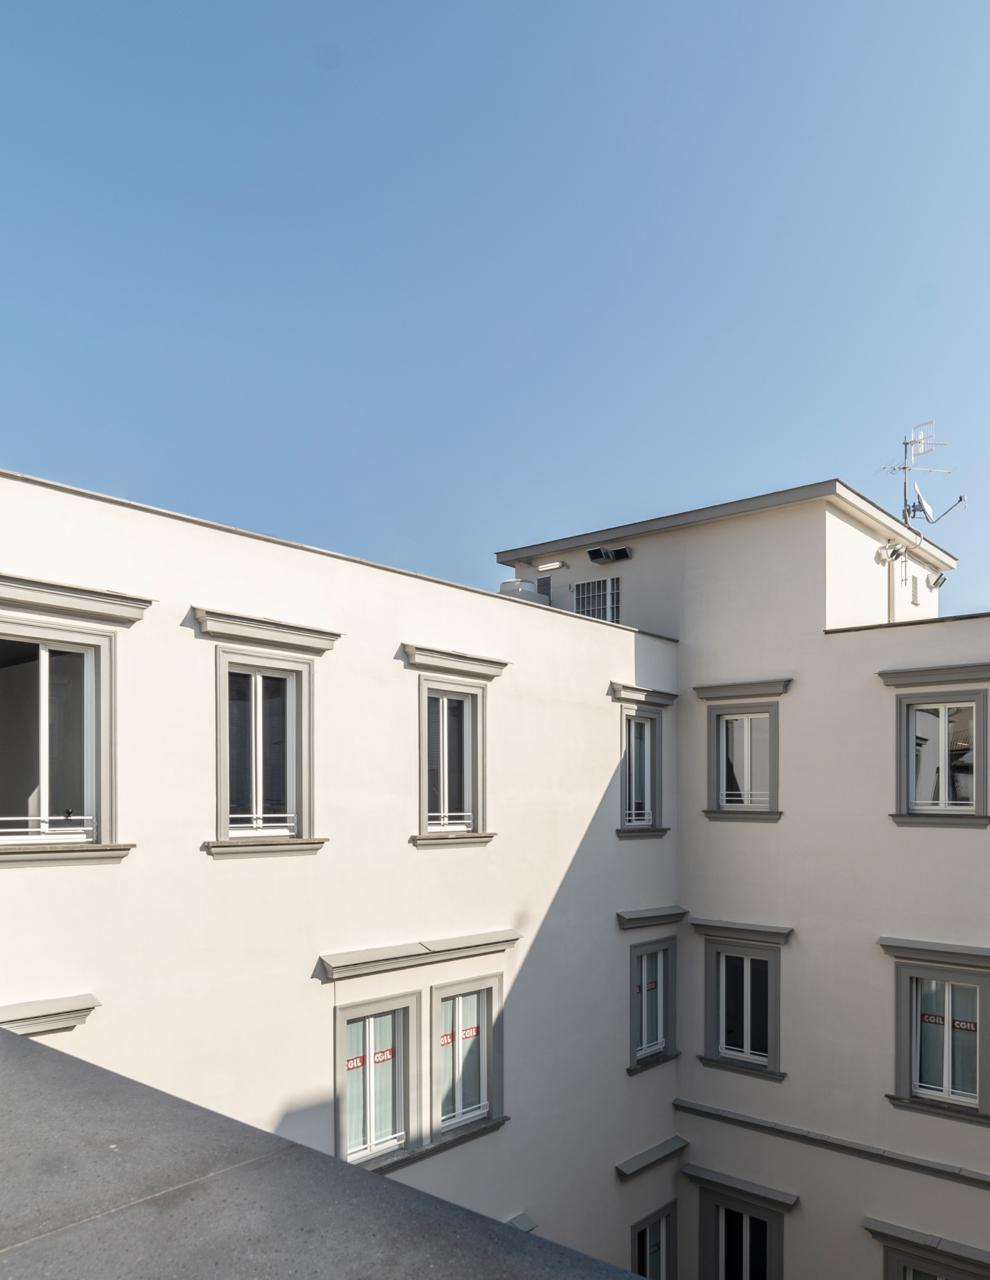 Anteprima Toledo Napoli - Immobili Cittamoderna